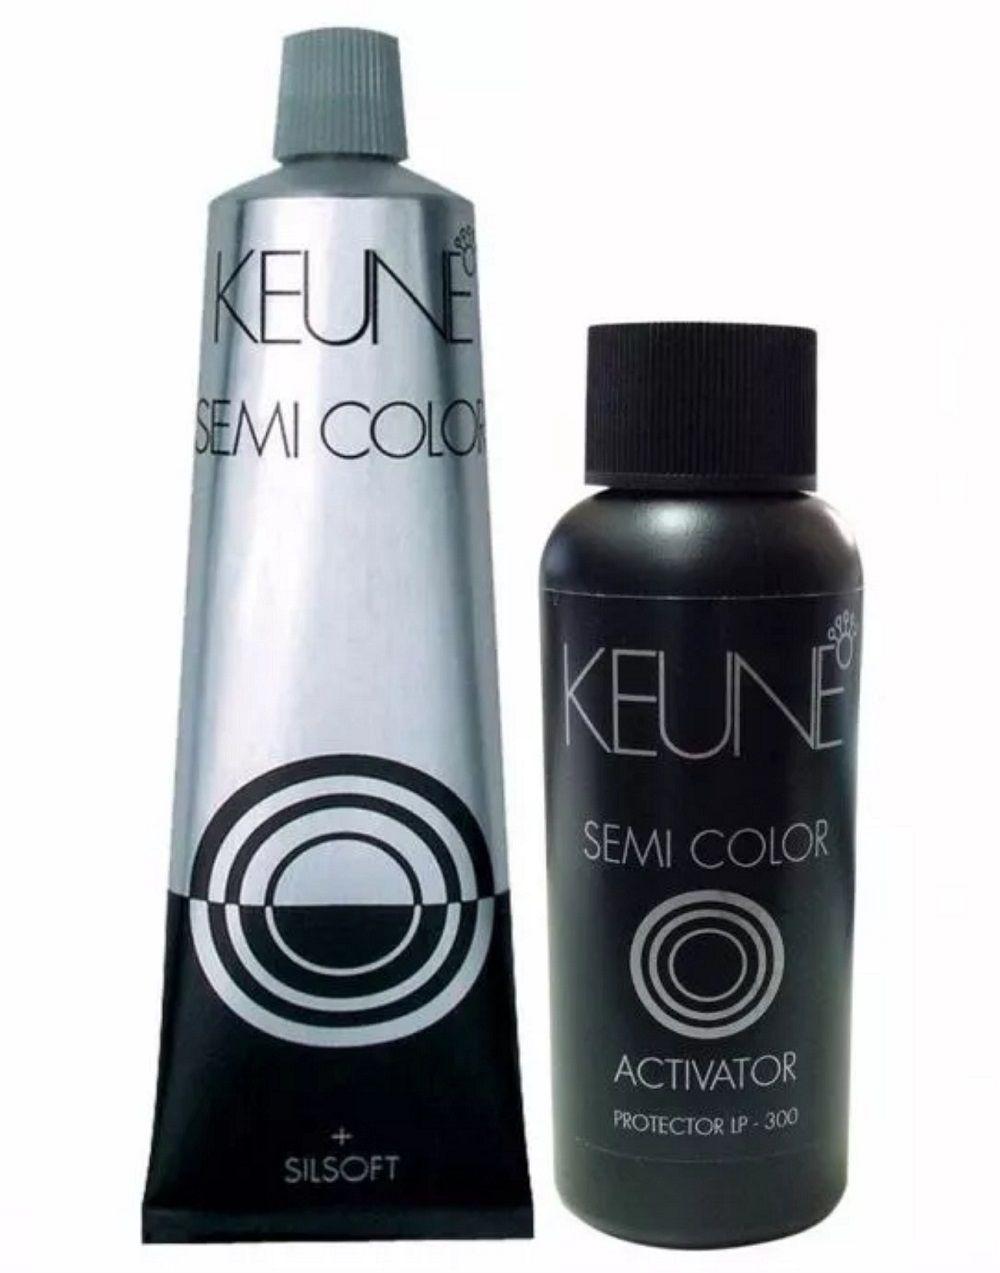 Kit Keune Tonalizante 60ml - Cor 1 - Preto + Ativador 60ml